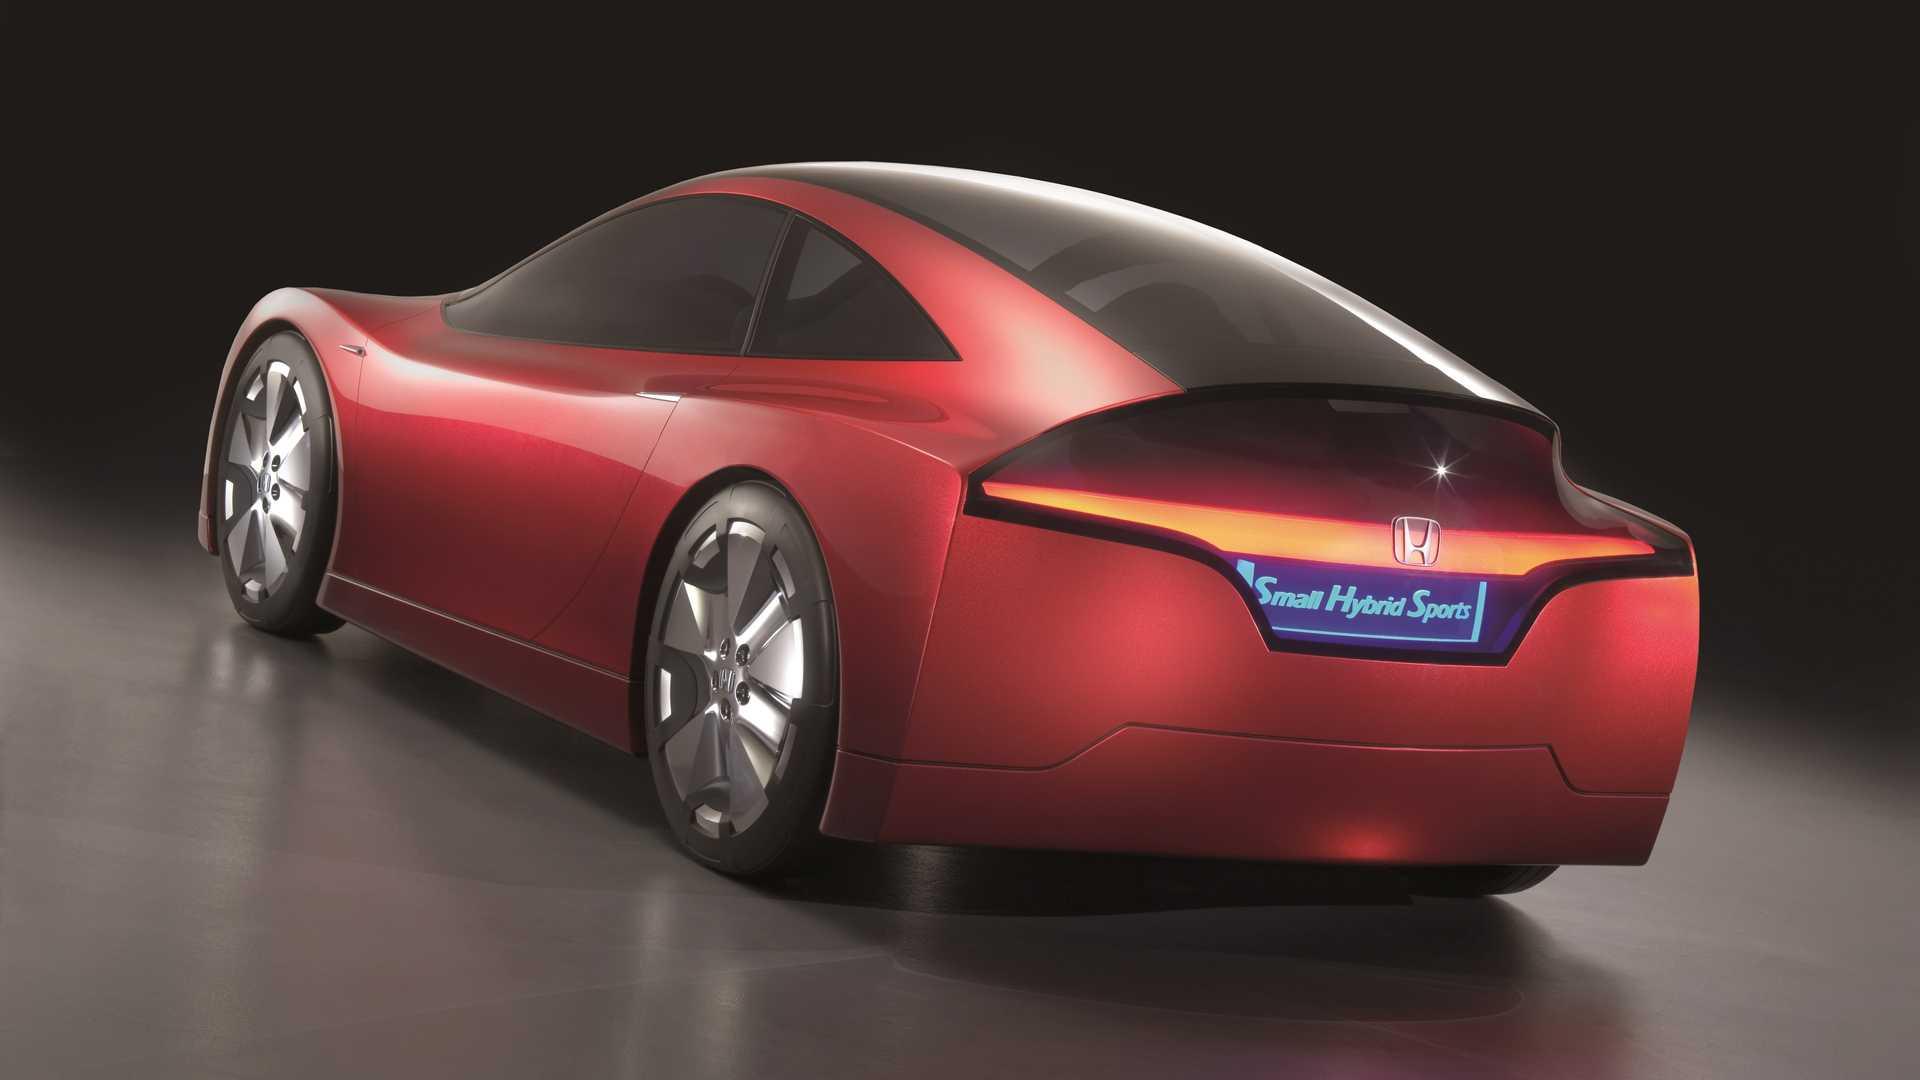 Honda Small Hybrid Sport Concept 2007